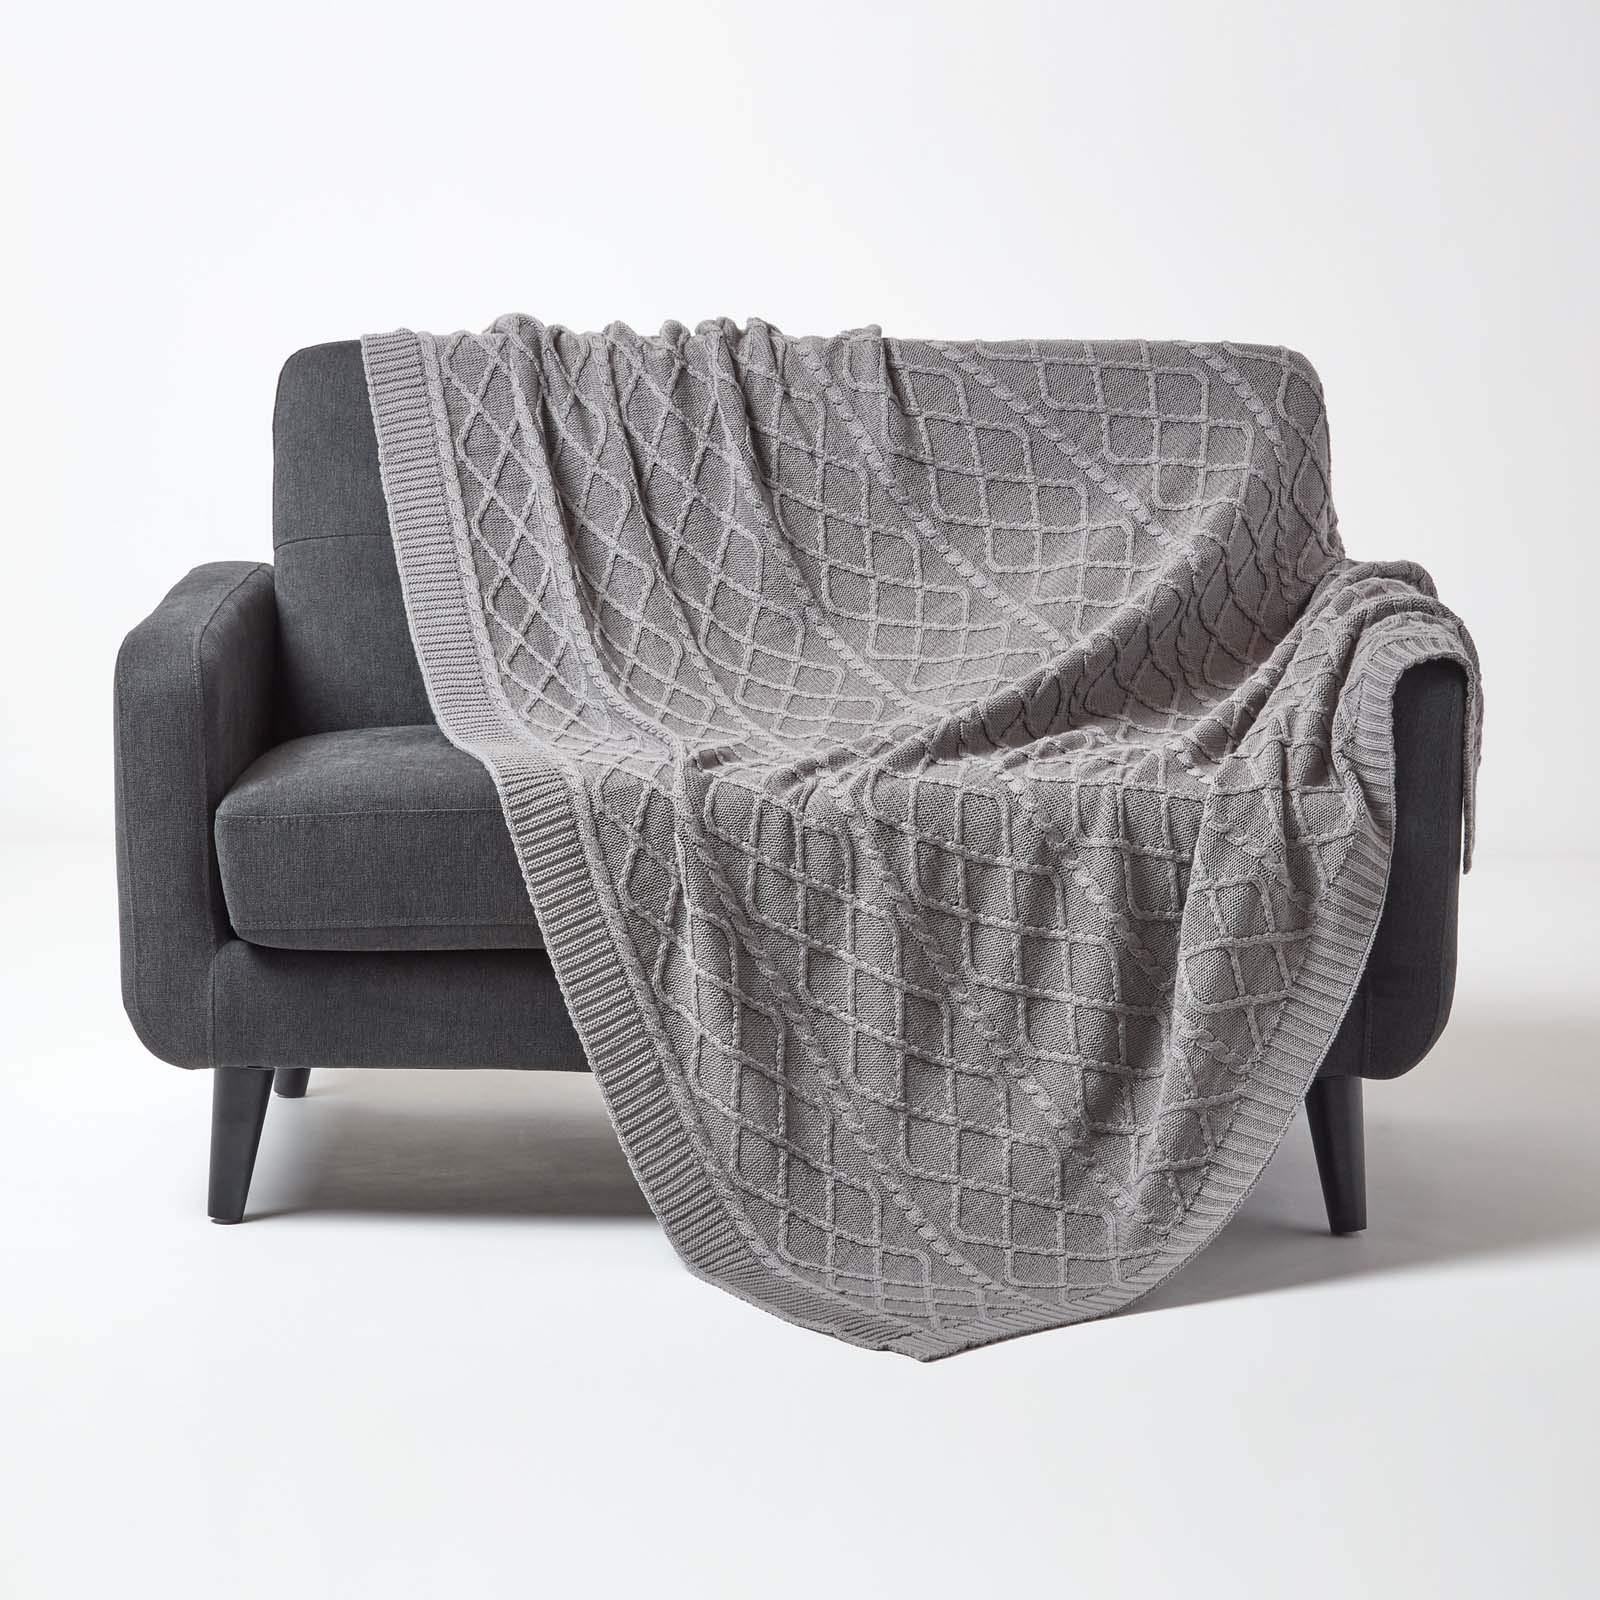 HOMESCAPES - Manta de Punto para Cama o sofá (100% algodón), diseño de Diamantes, 100% algodón, Gris, 130 x 170 cm: Amazon.es: Hogar